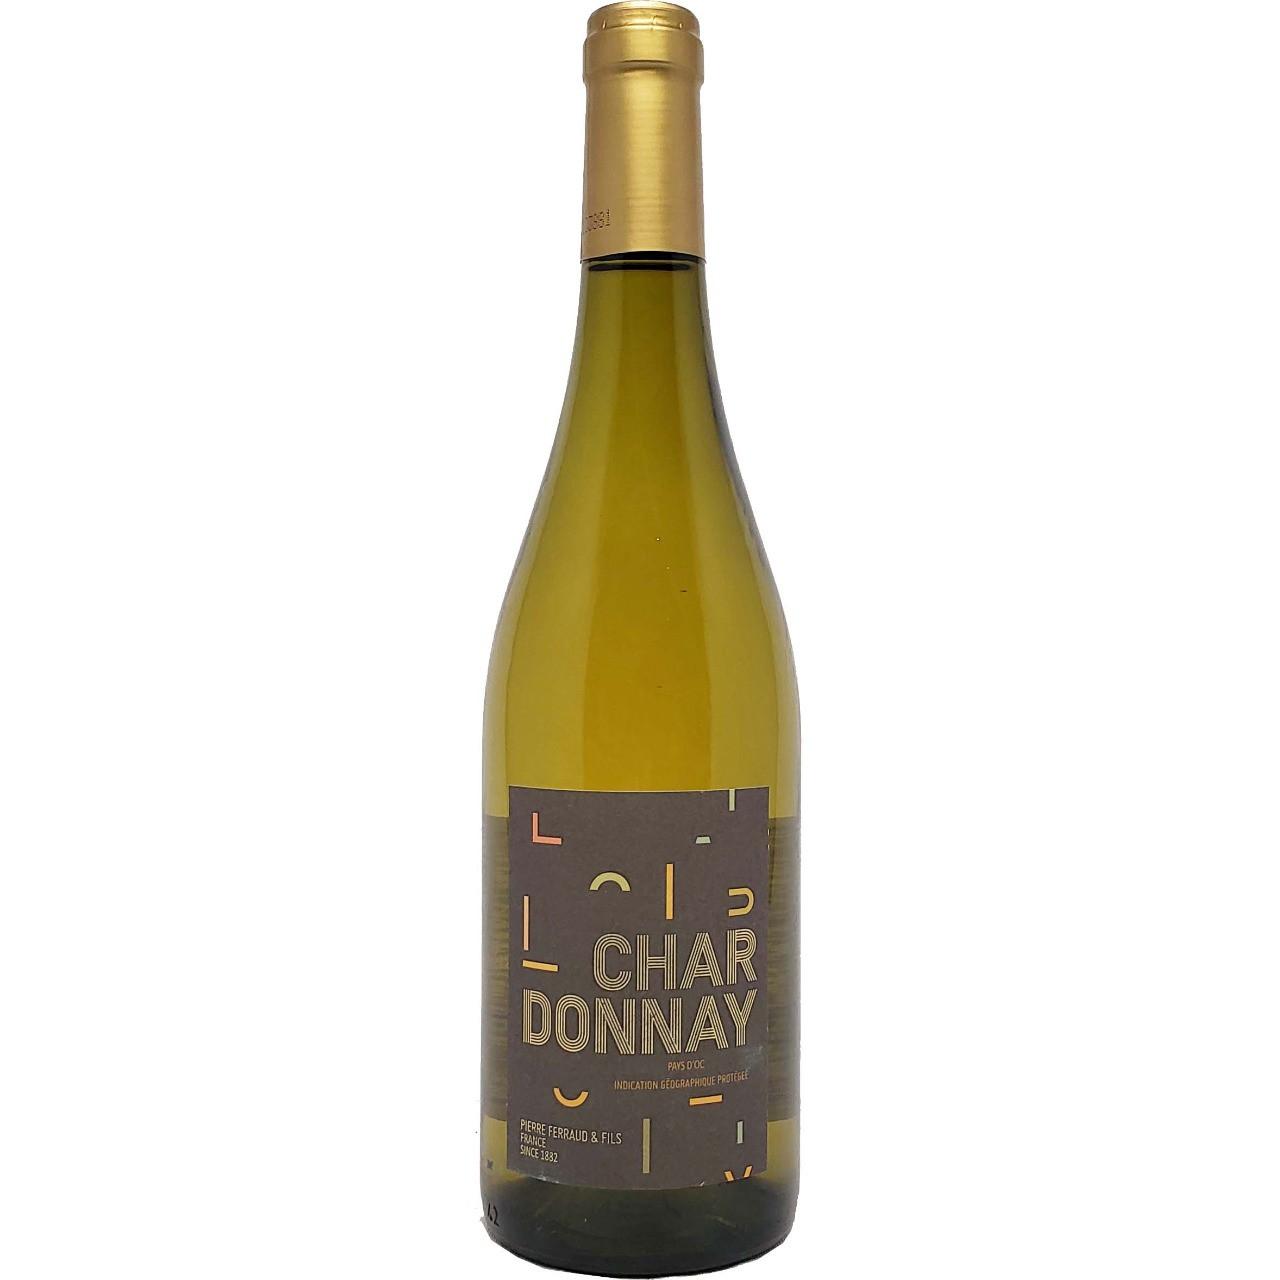 Vinho Branco Chardonnay Pierre Ferraud & Fils - 750ml -